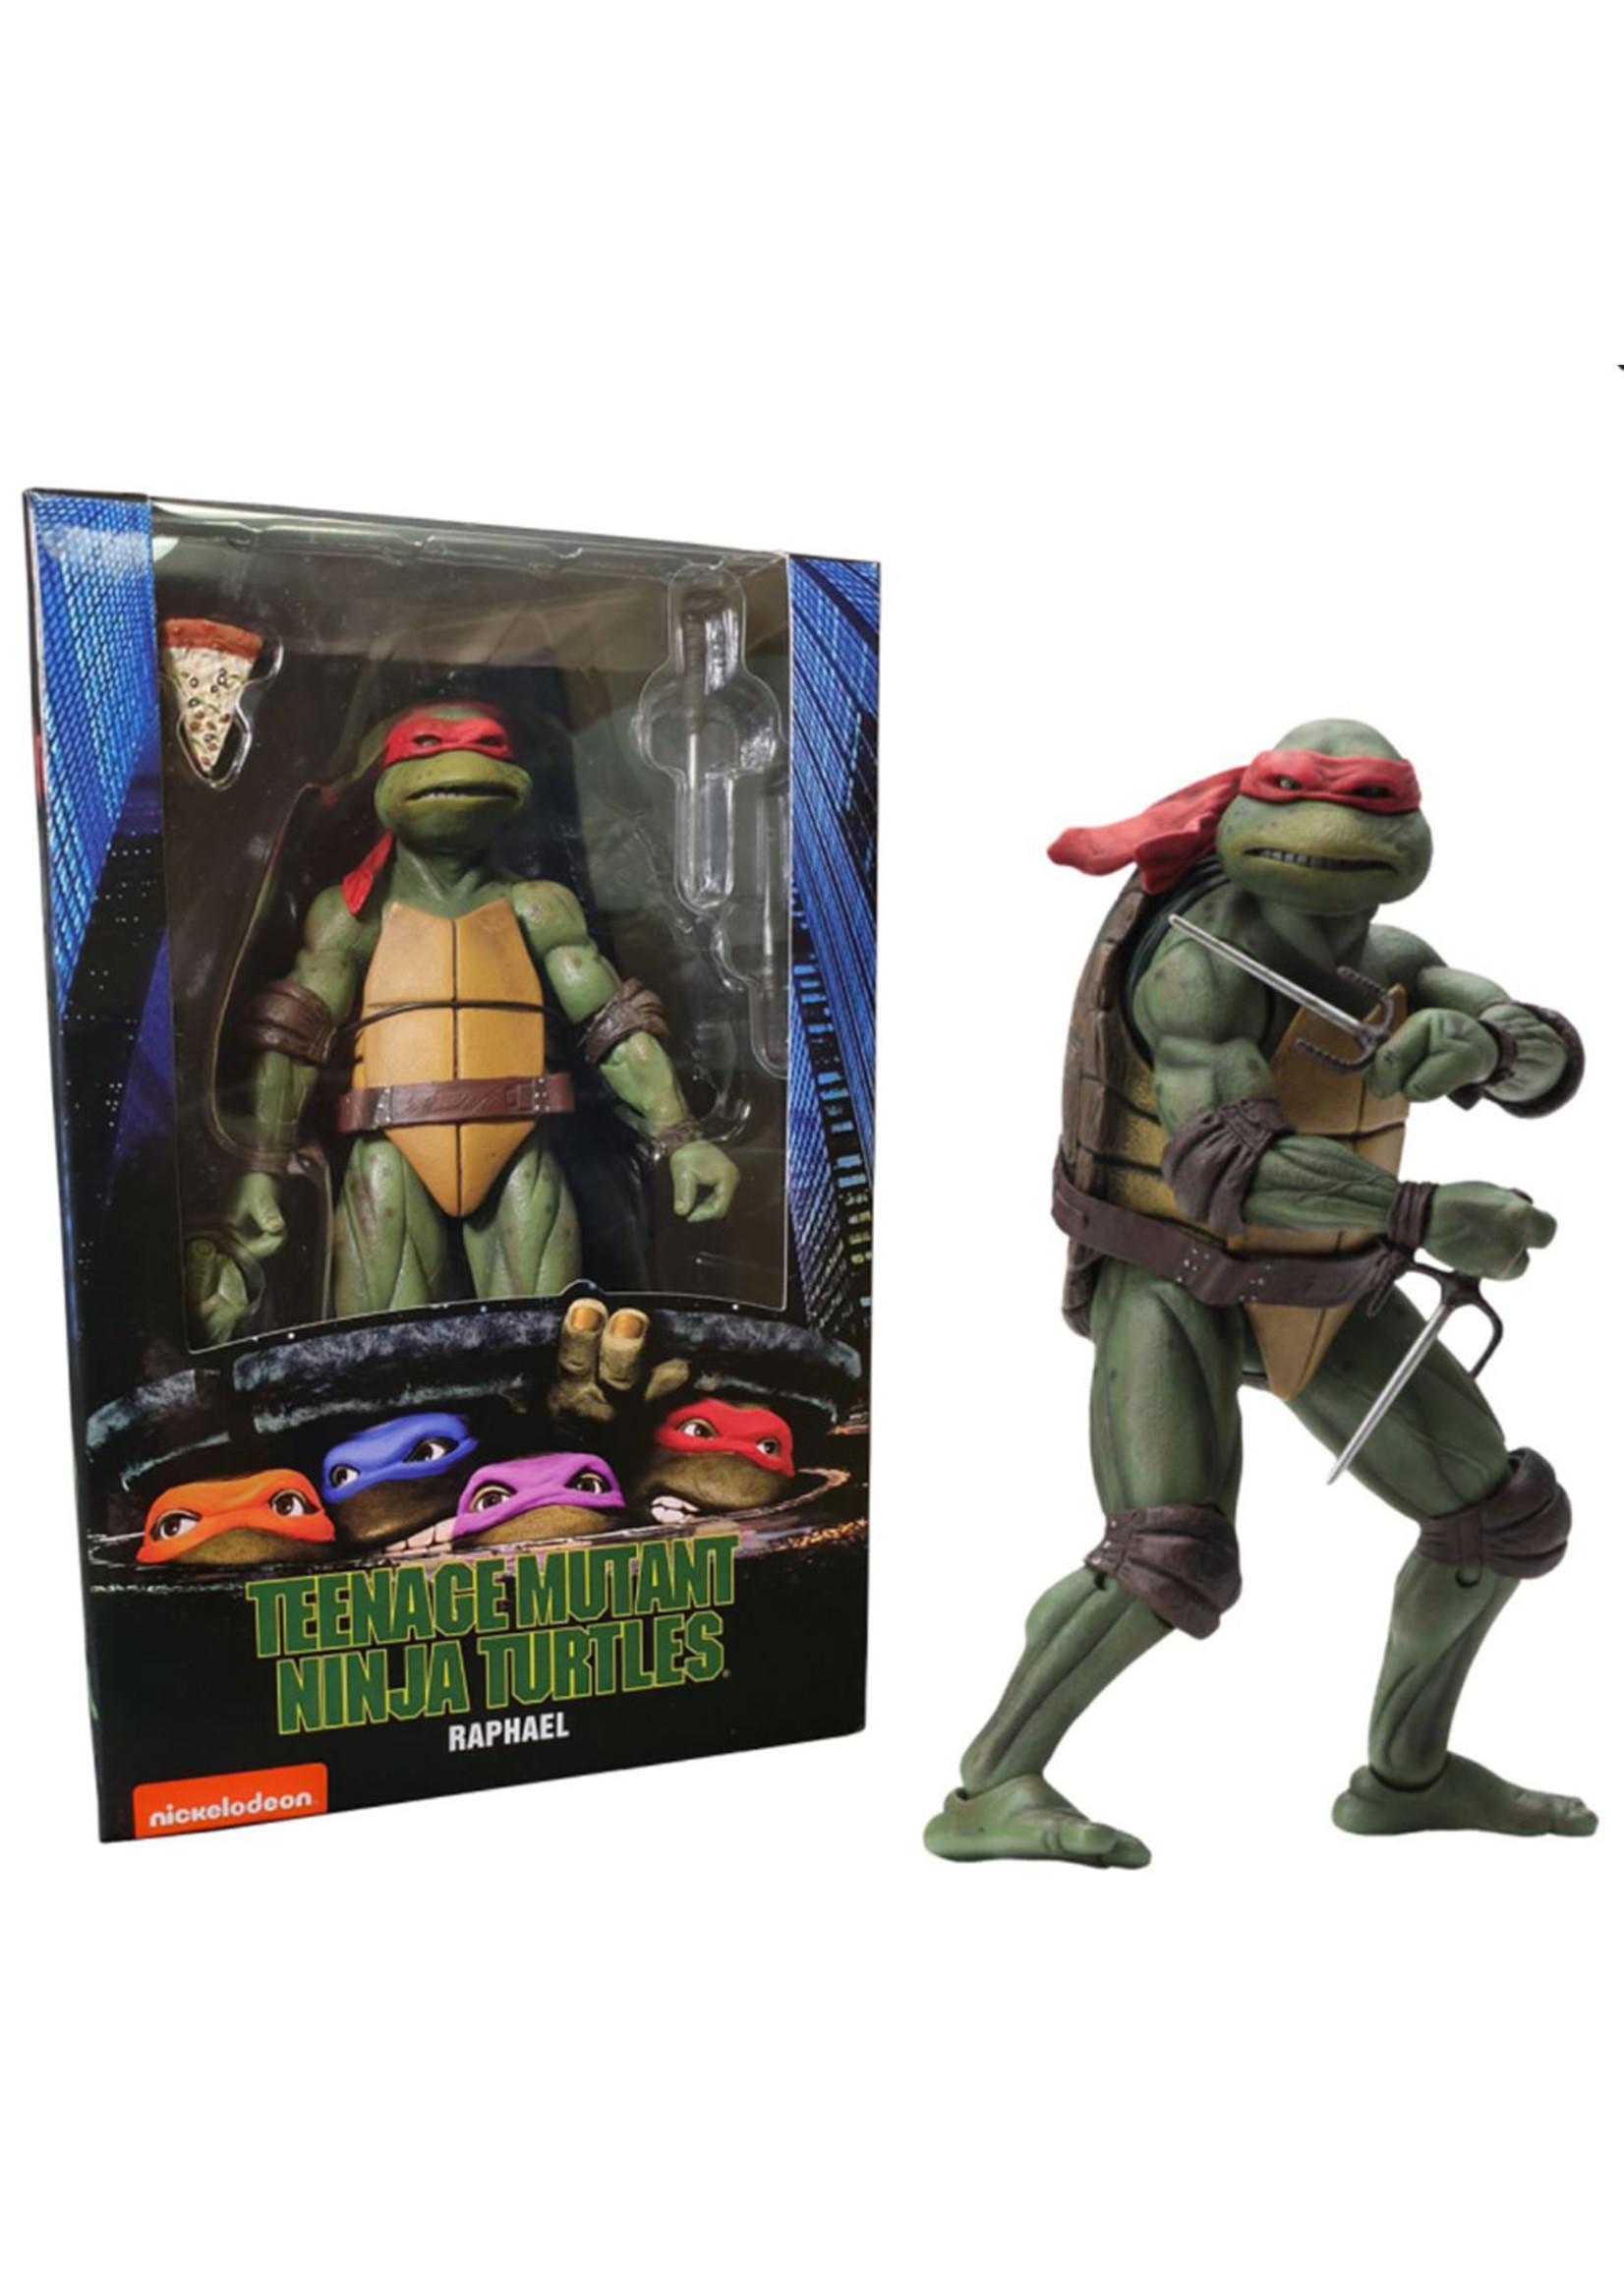 Neca TMNT - Raphael